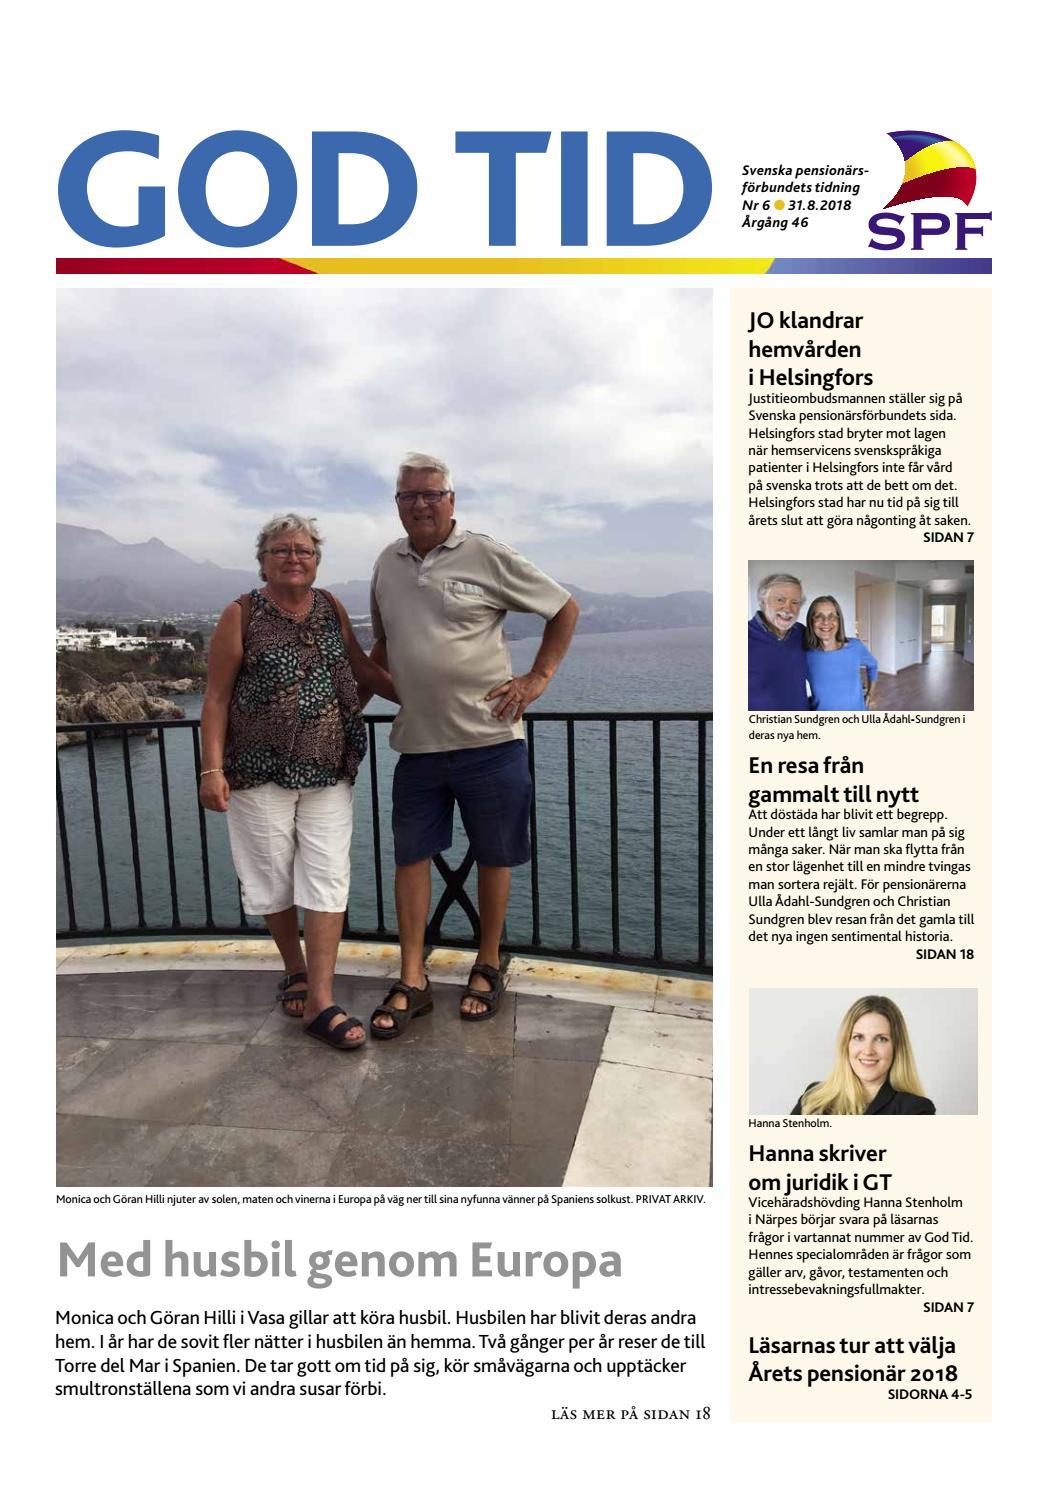 festsånger 50 år God Tid 6/2018 by Svenska pensionärsförbundet, God Tid   issuu festsånger 50 år